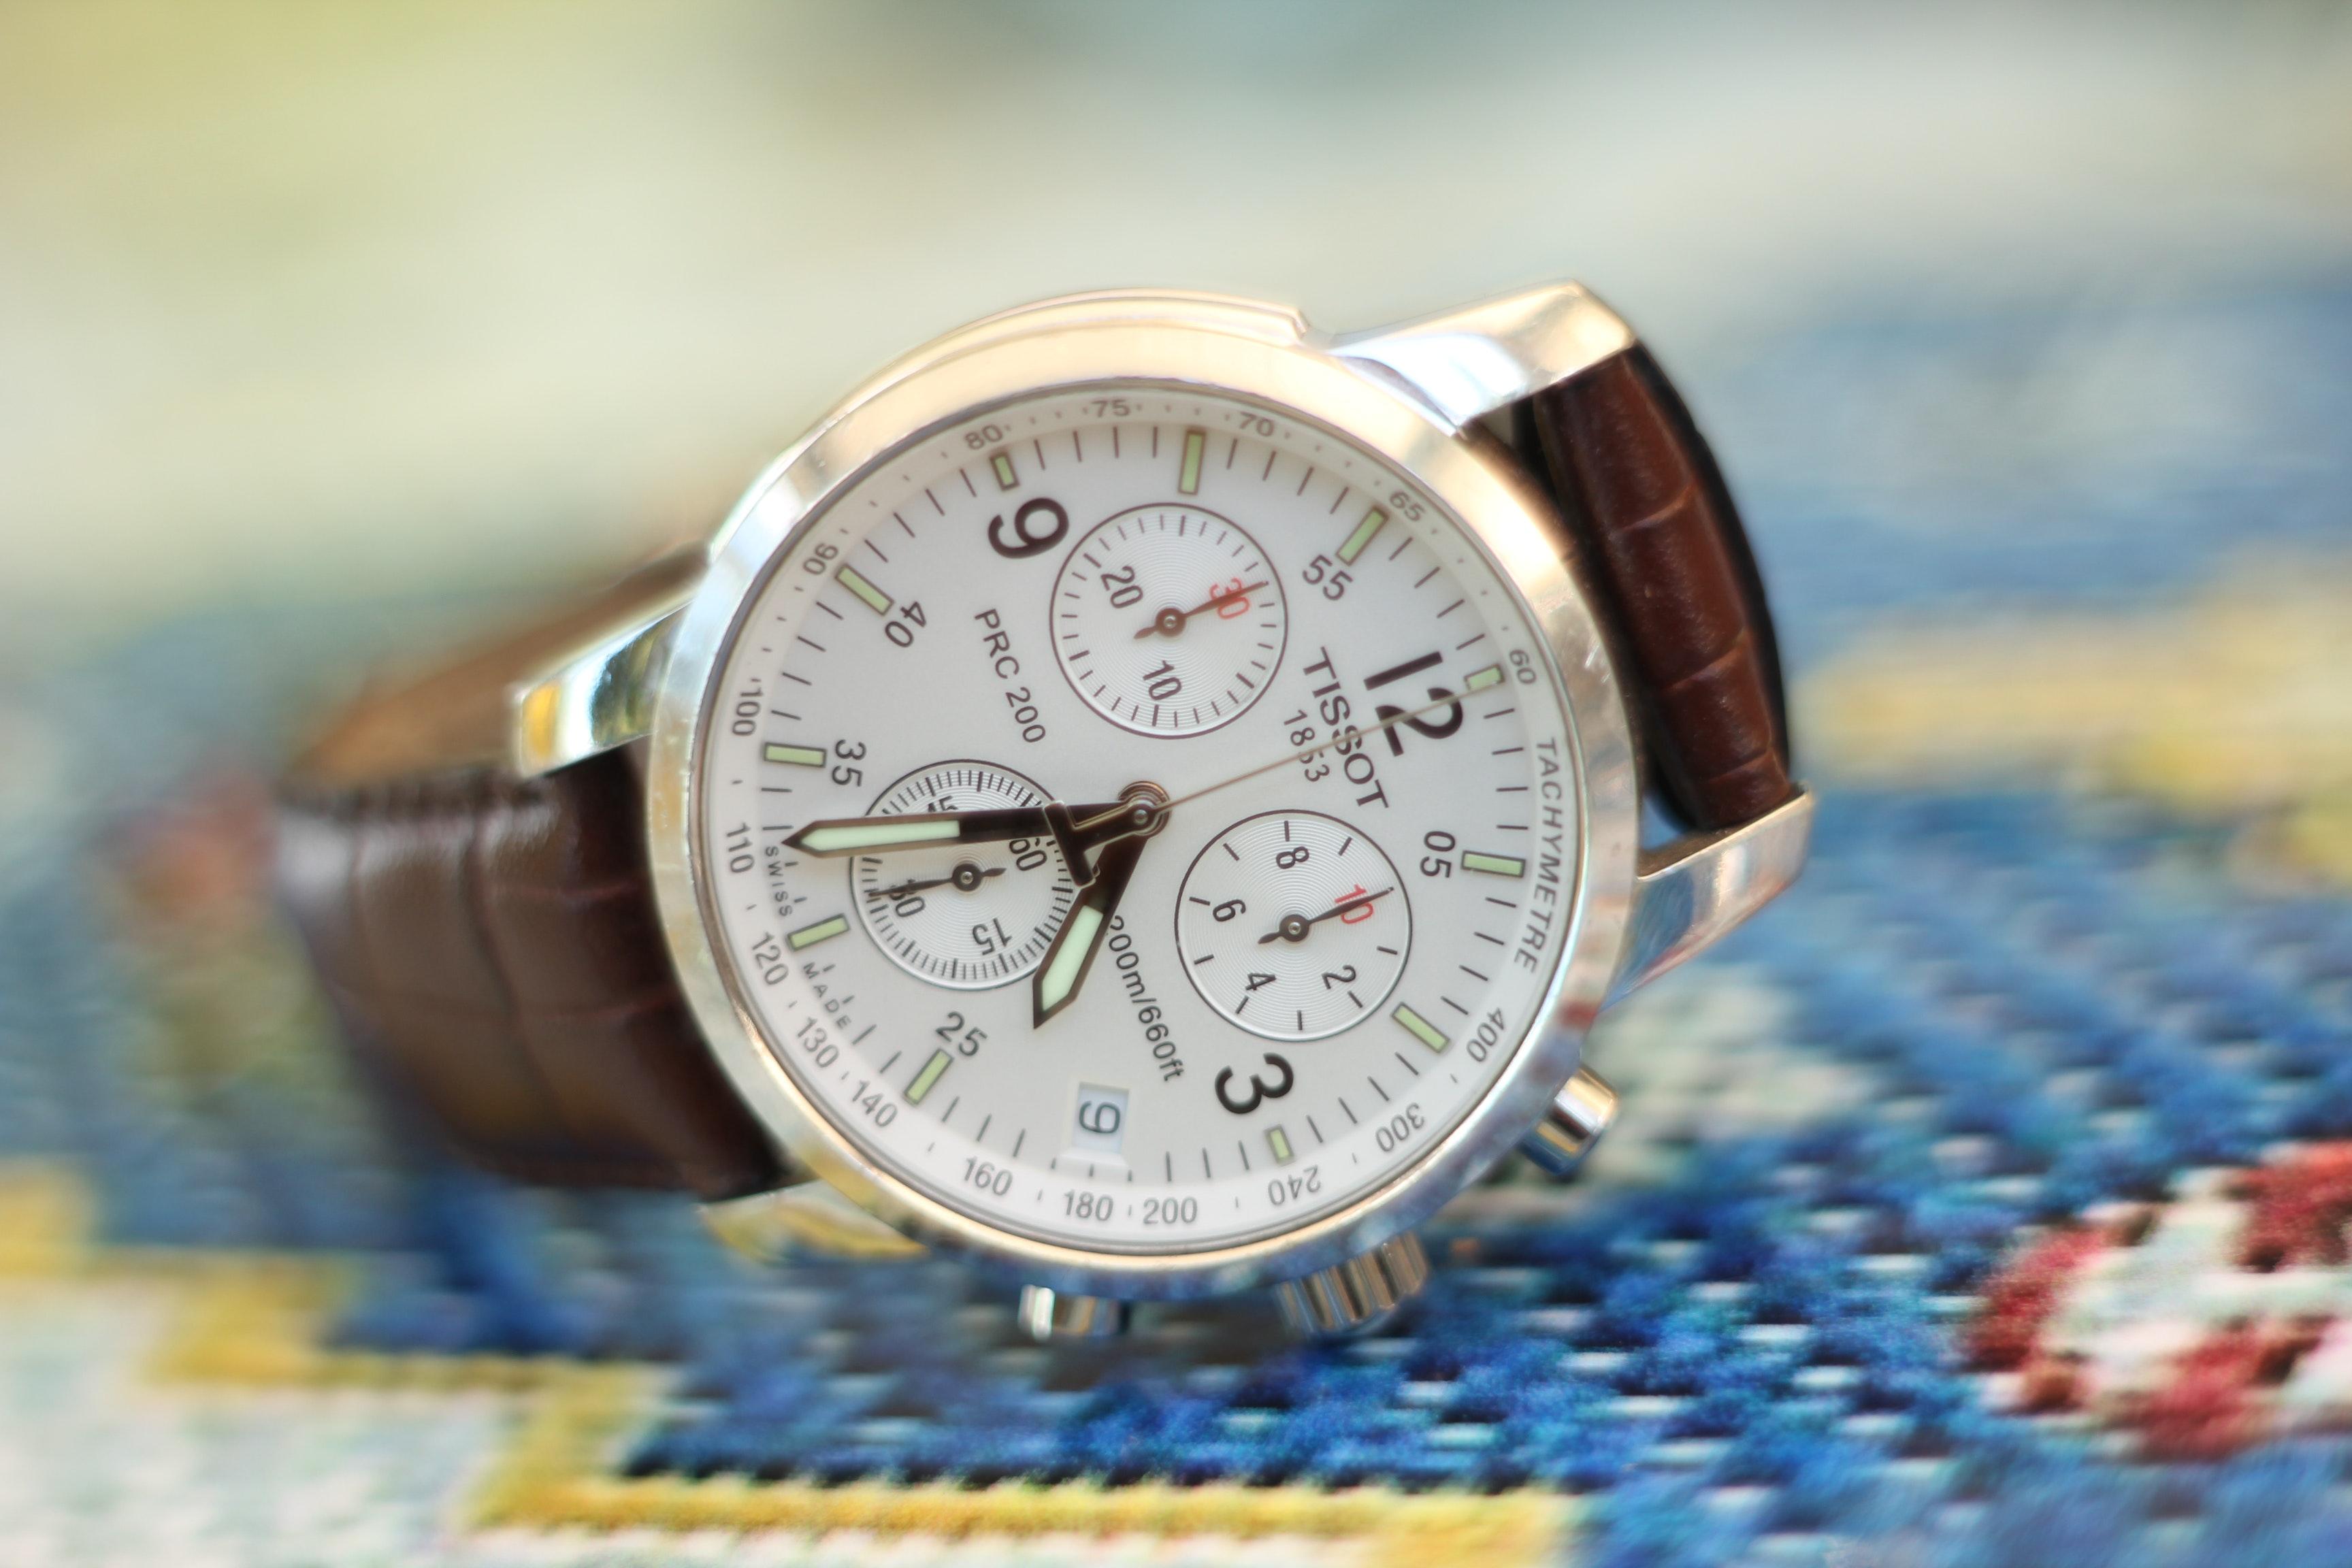 Free stock photo of Tissot Men\'s Watches